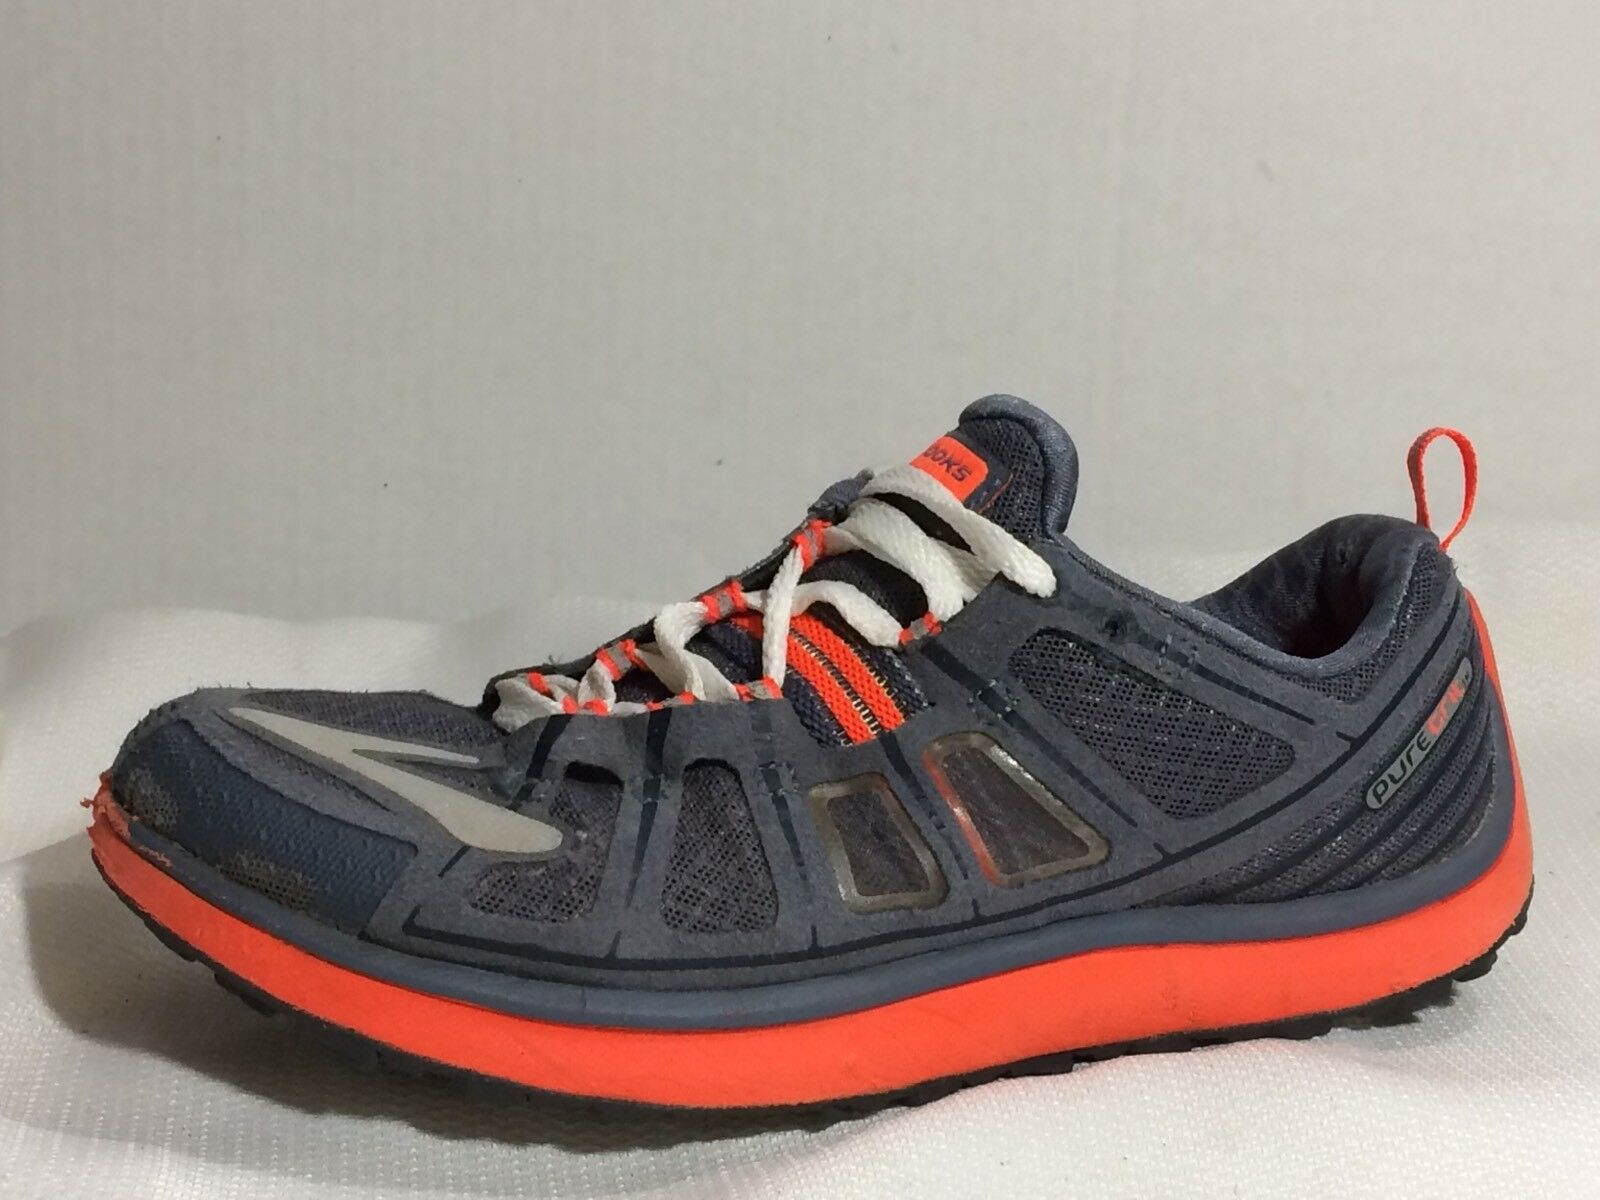 Brooks Brooks Brooks Pure Grit 2 Damenschuhe 8 Med Trail Running Schuhes 1201331B674 Gray Neon Orange f3c6e5